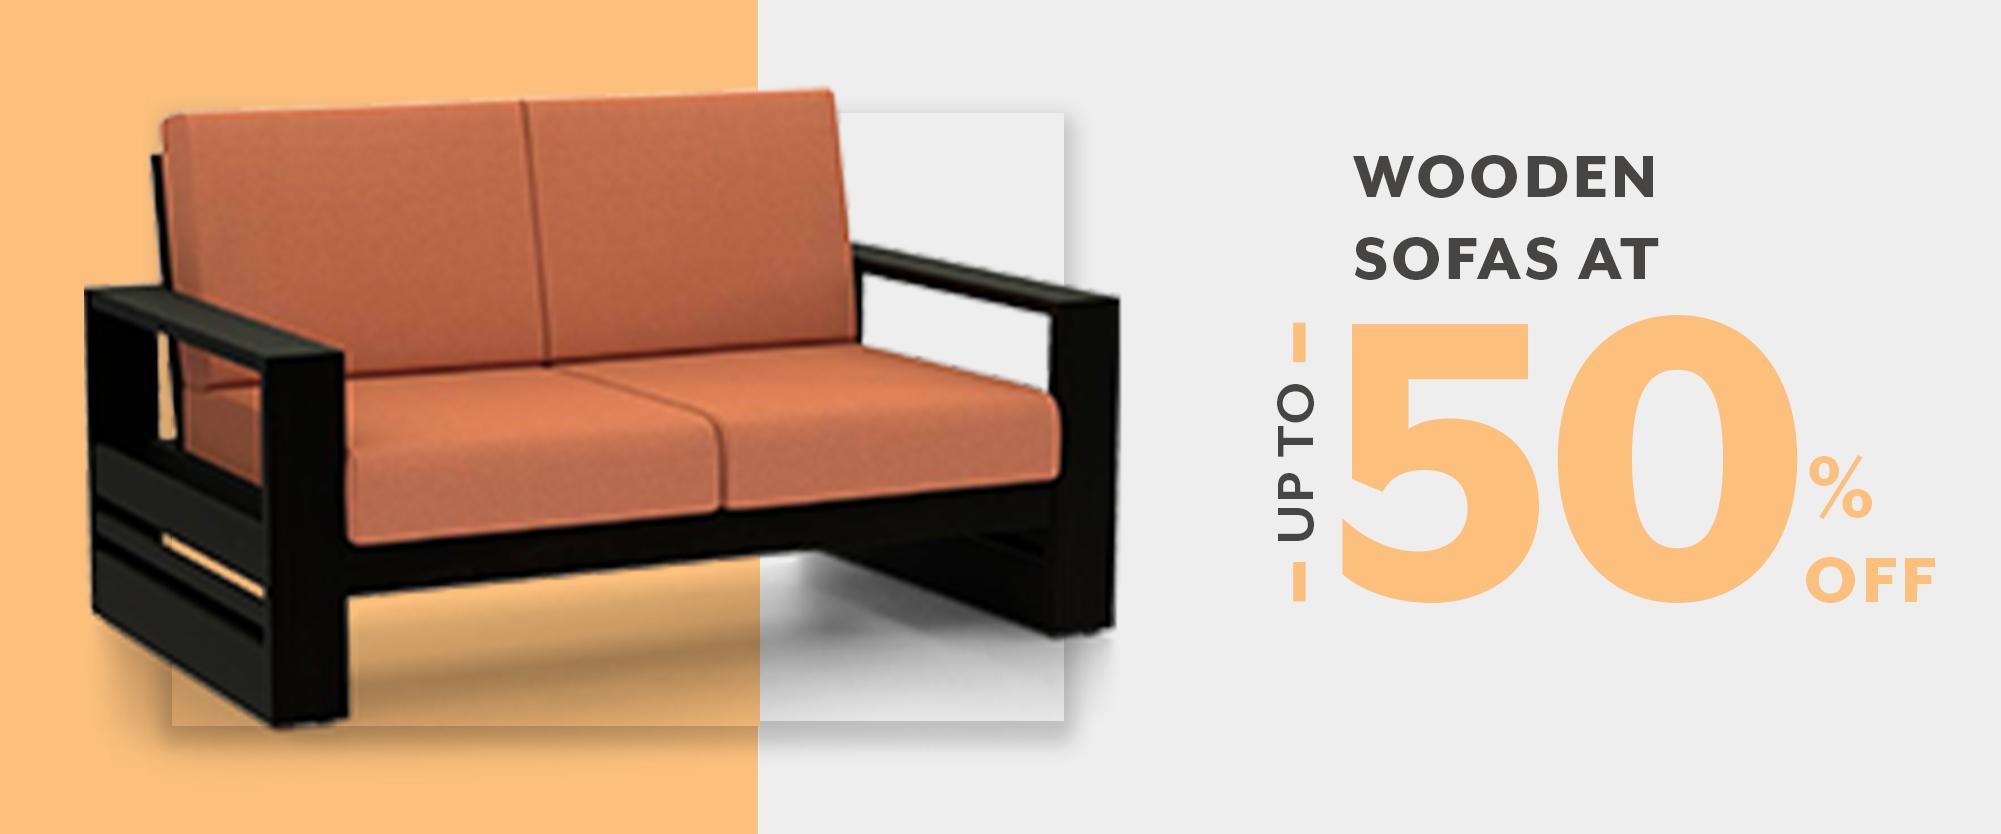 Ssm june 2021 landing pagedesk   wooden sofas